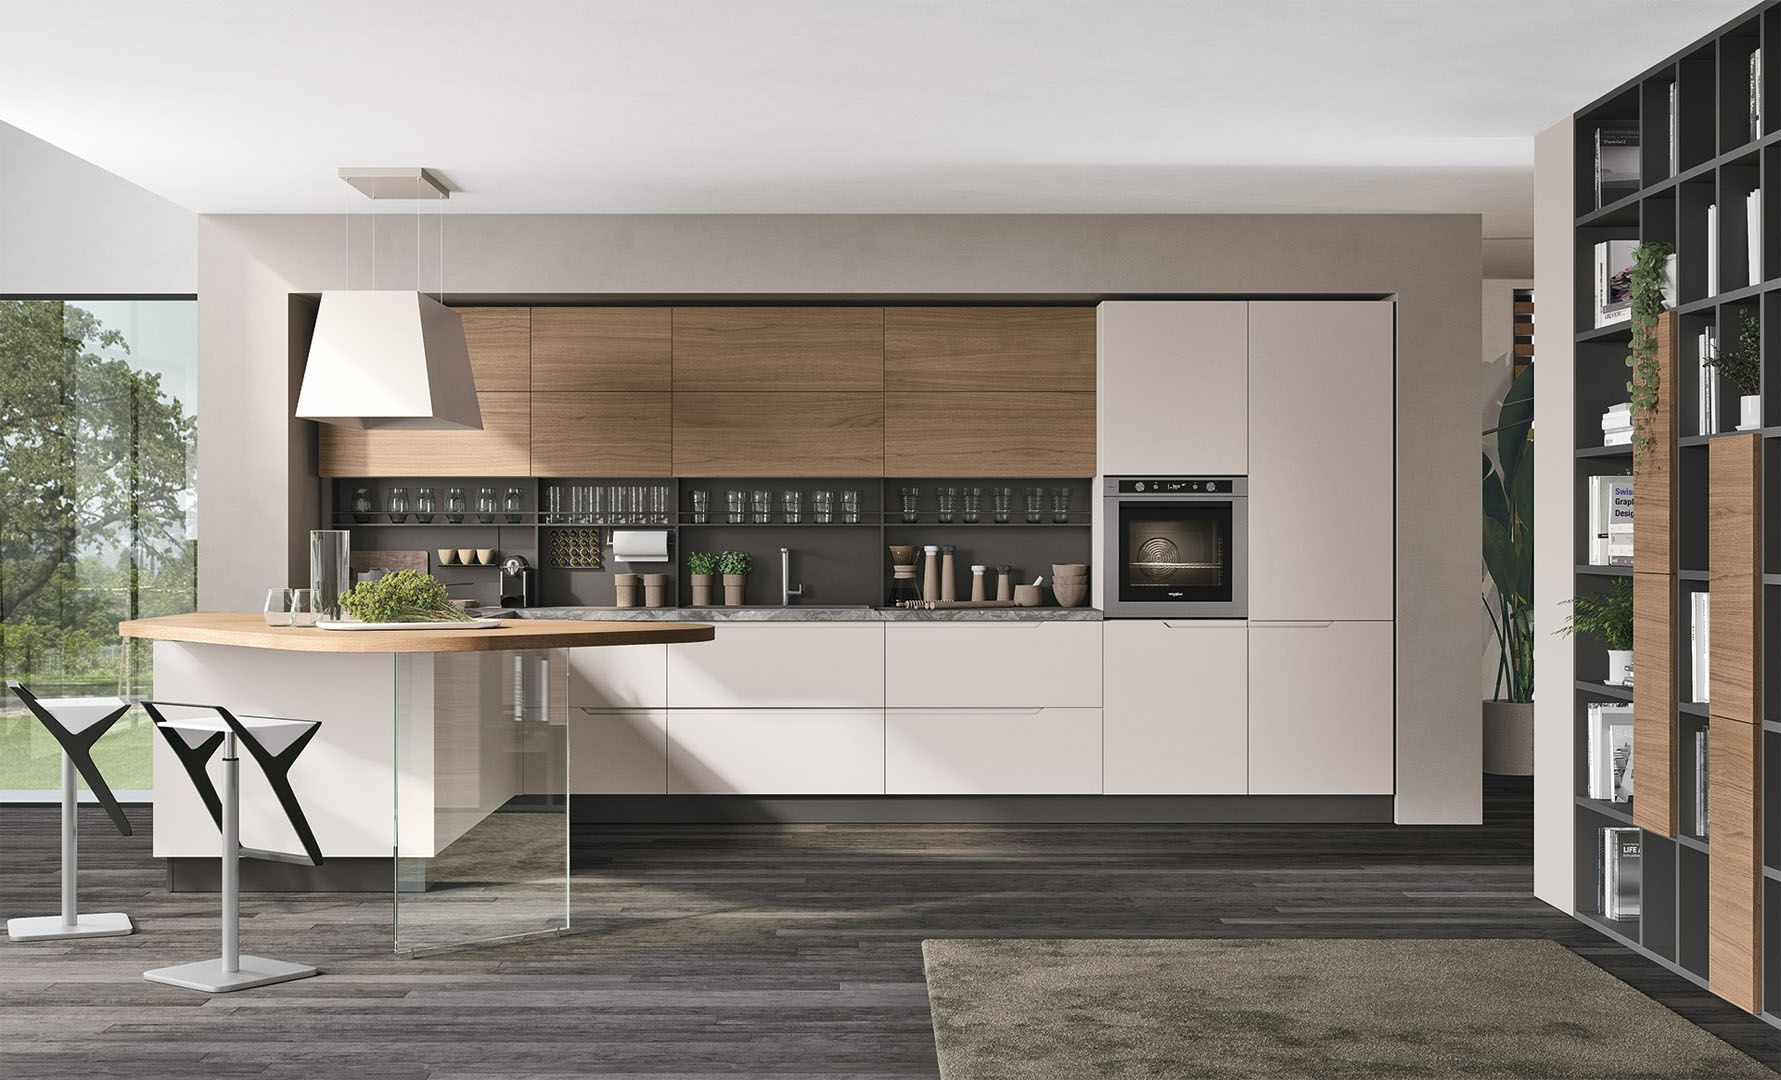 Casa Tua Arredamenti Rovato Кухня lube luna в 2020 г. | Кухонный полуостров, Итальянские